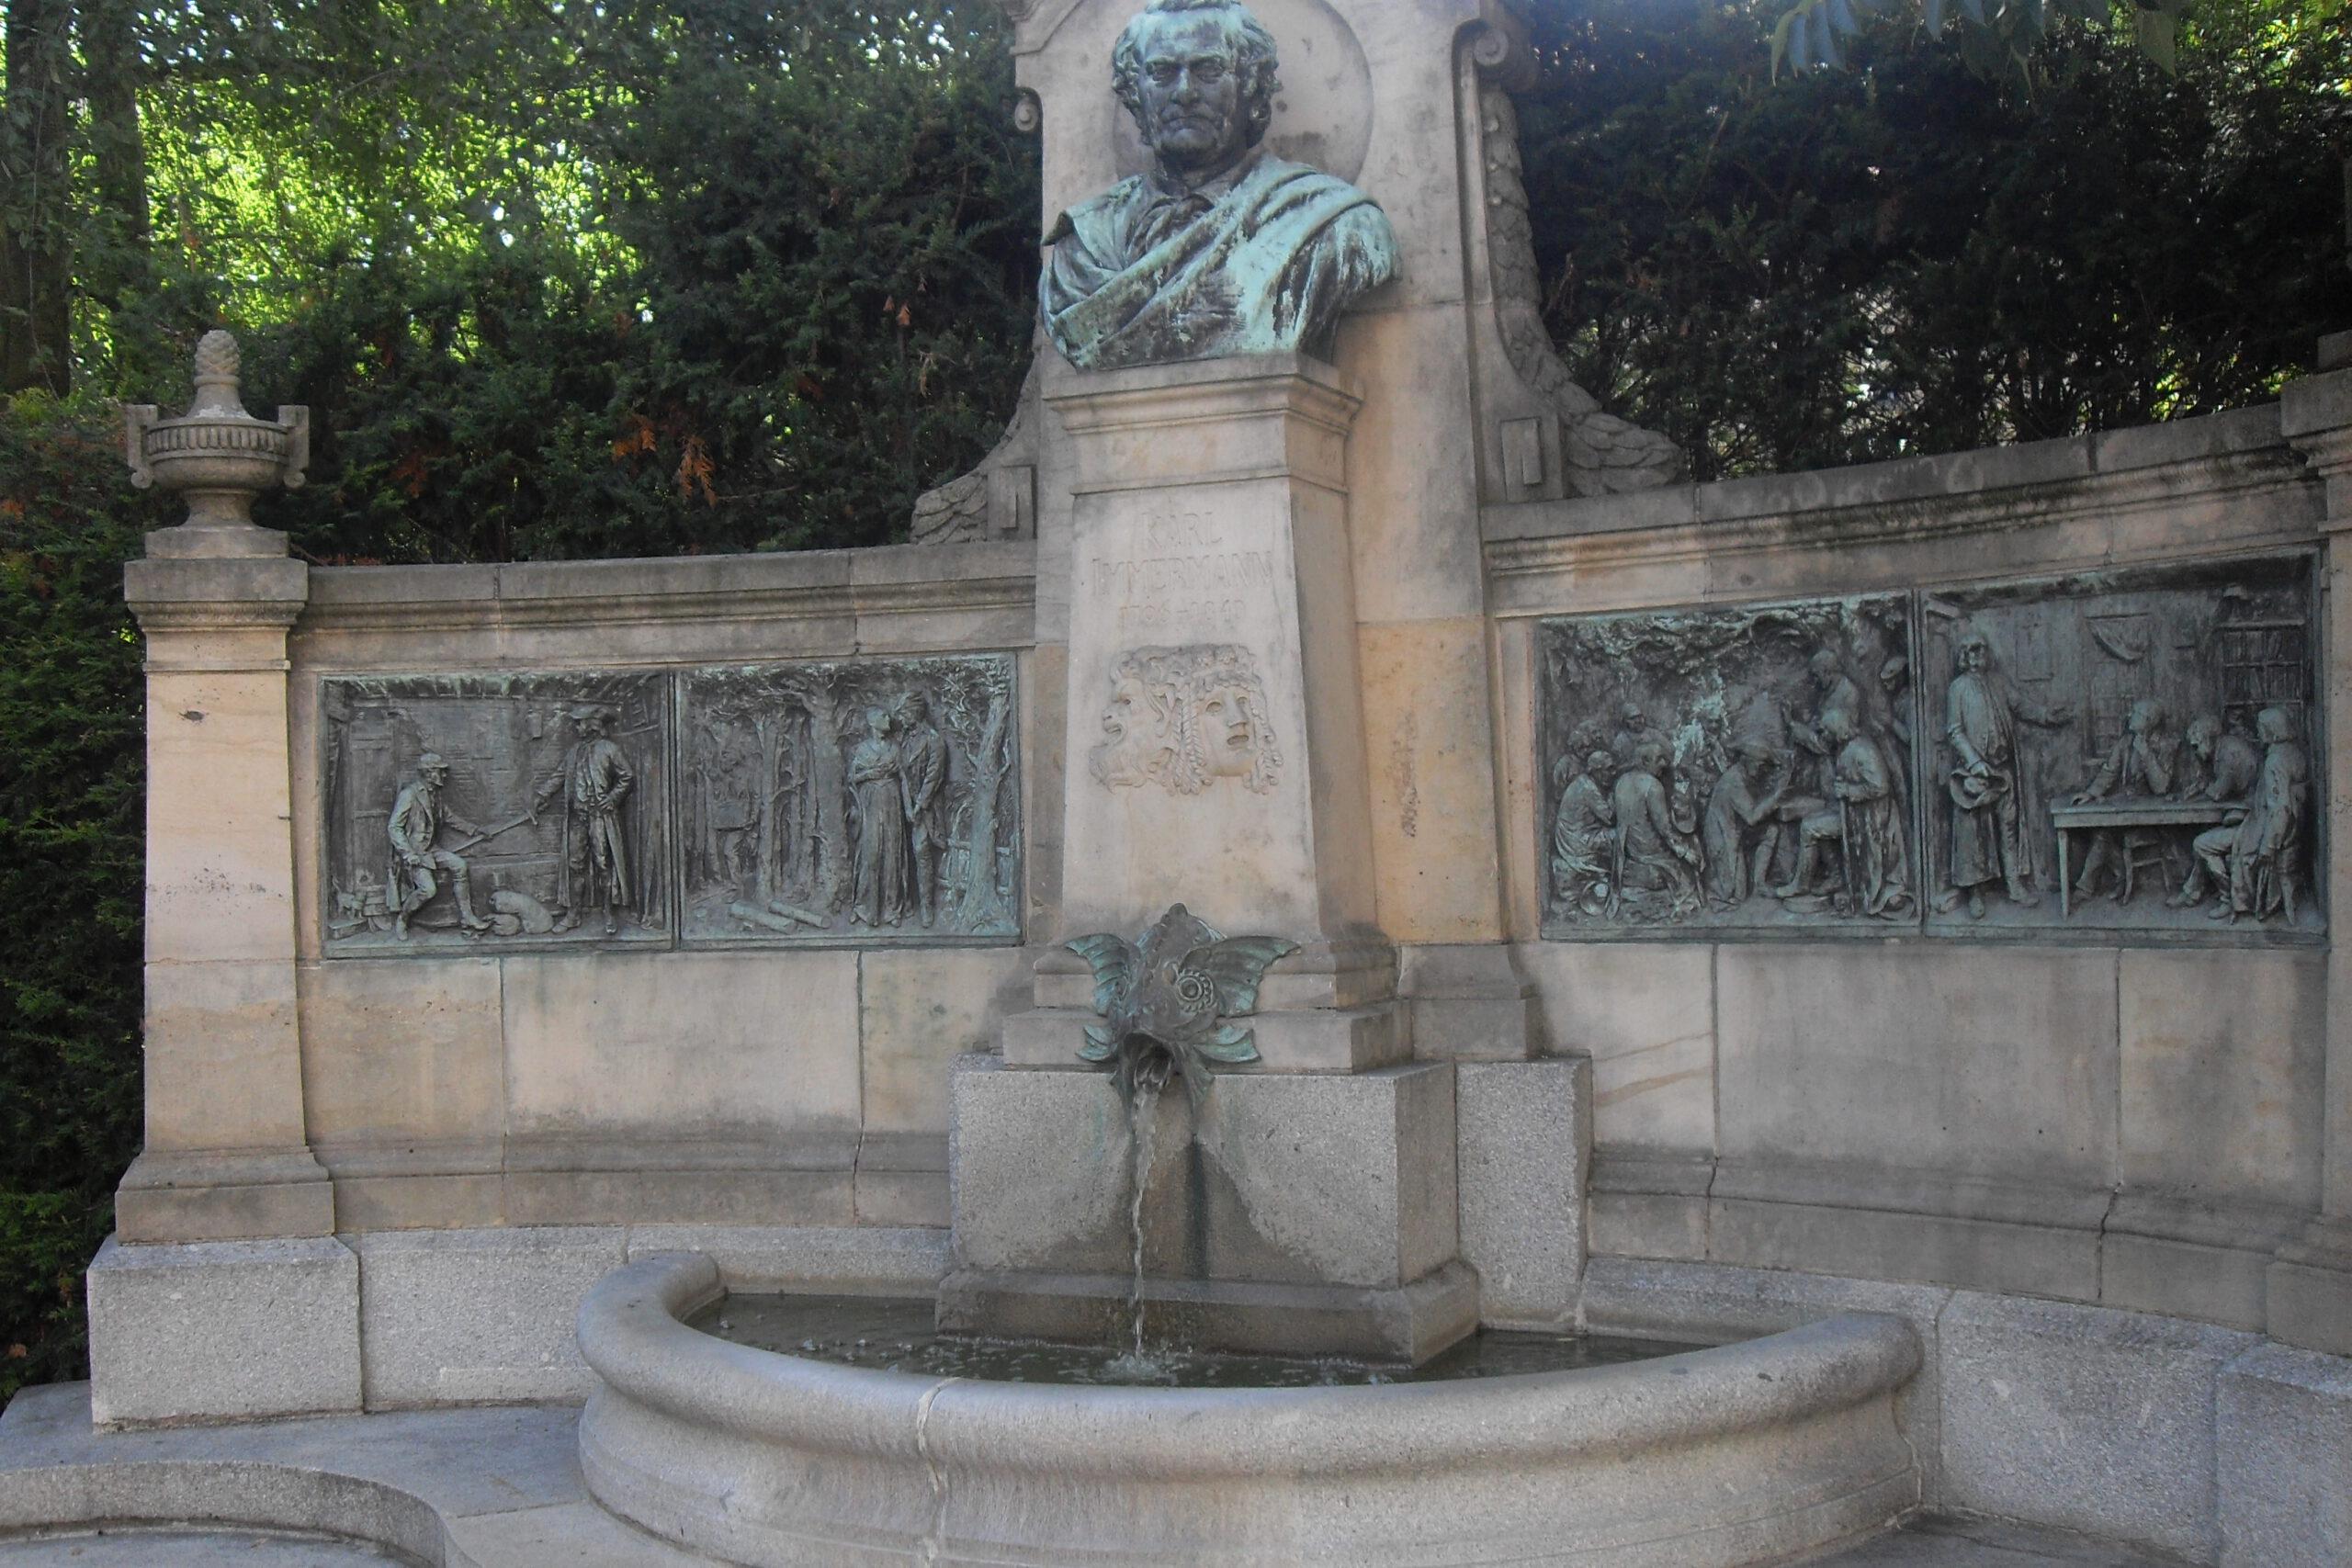 225 Jahre Carl Leberecht Immermann